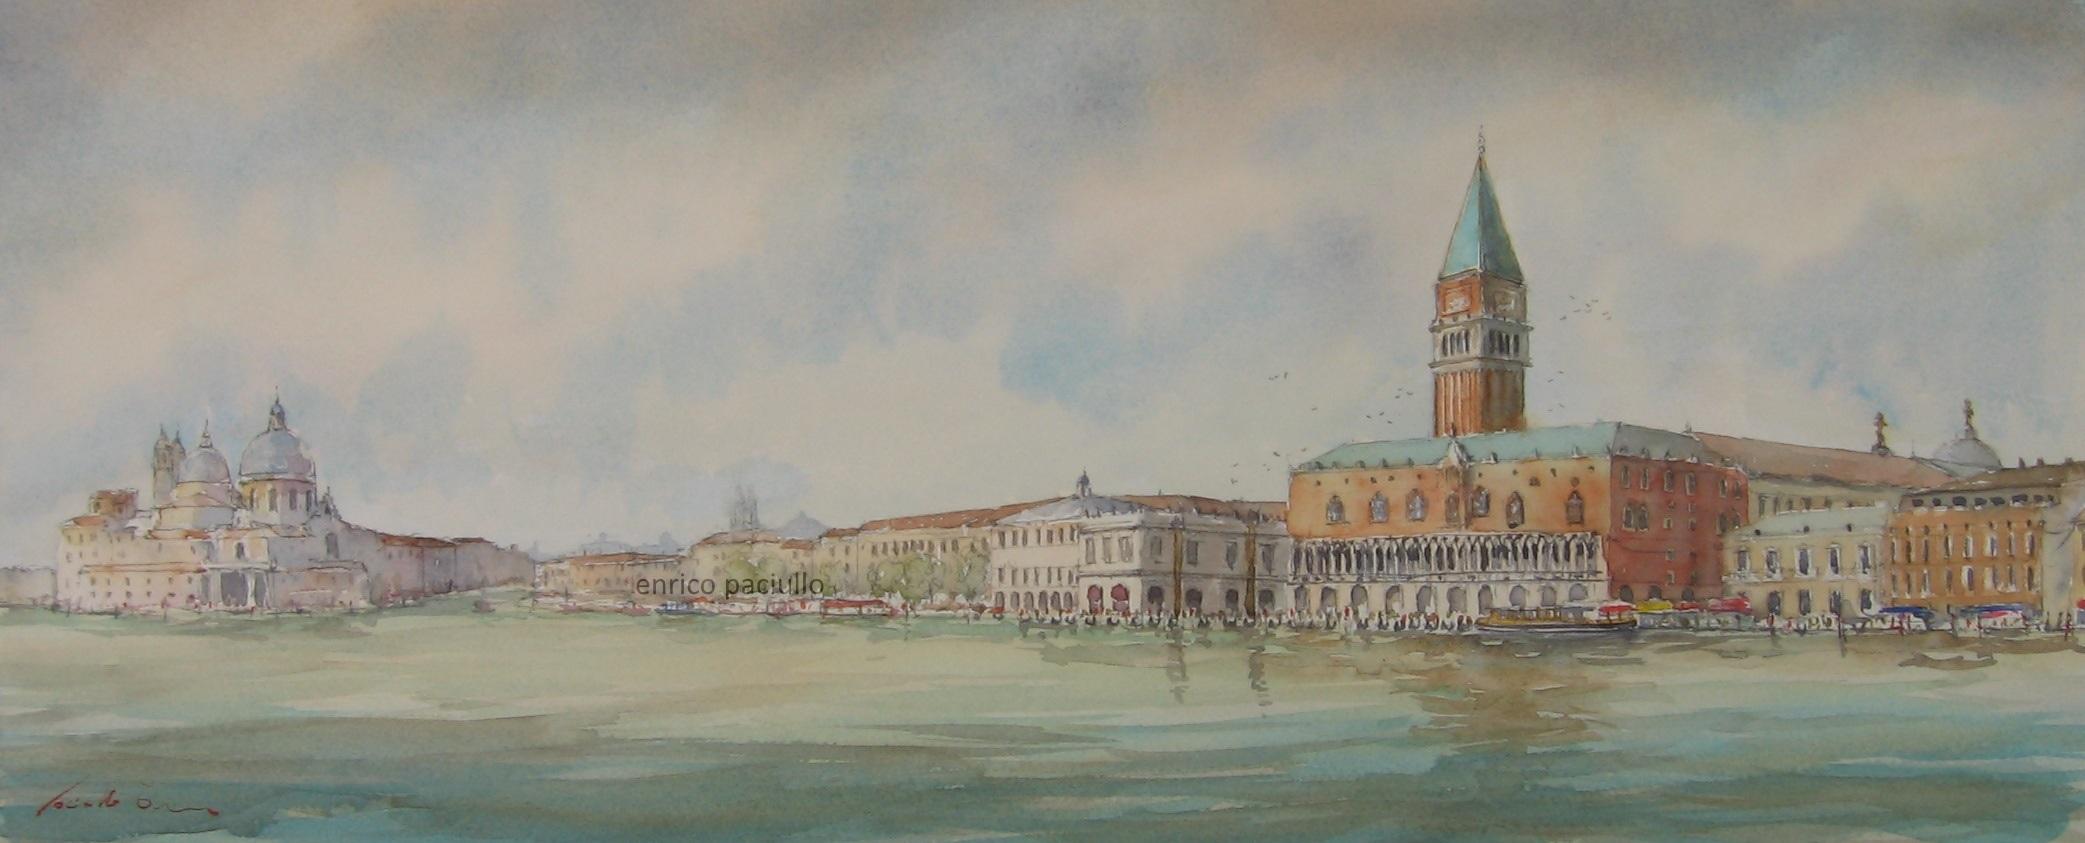 Venezia Nº 269 jpeg